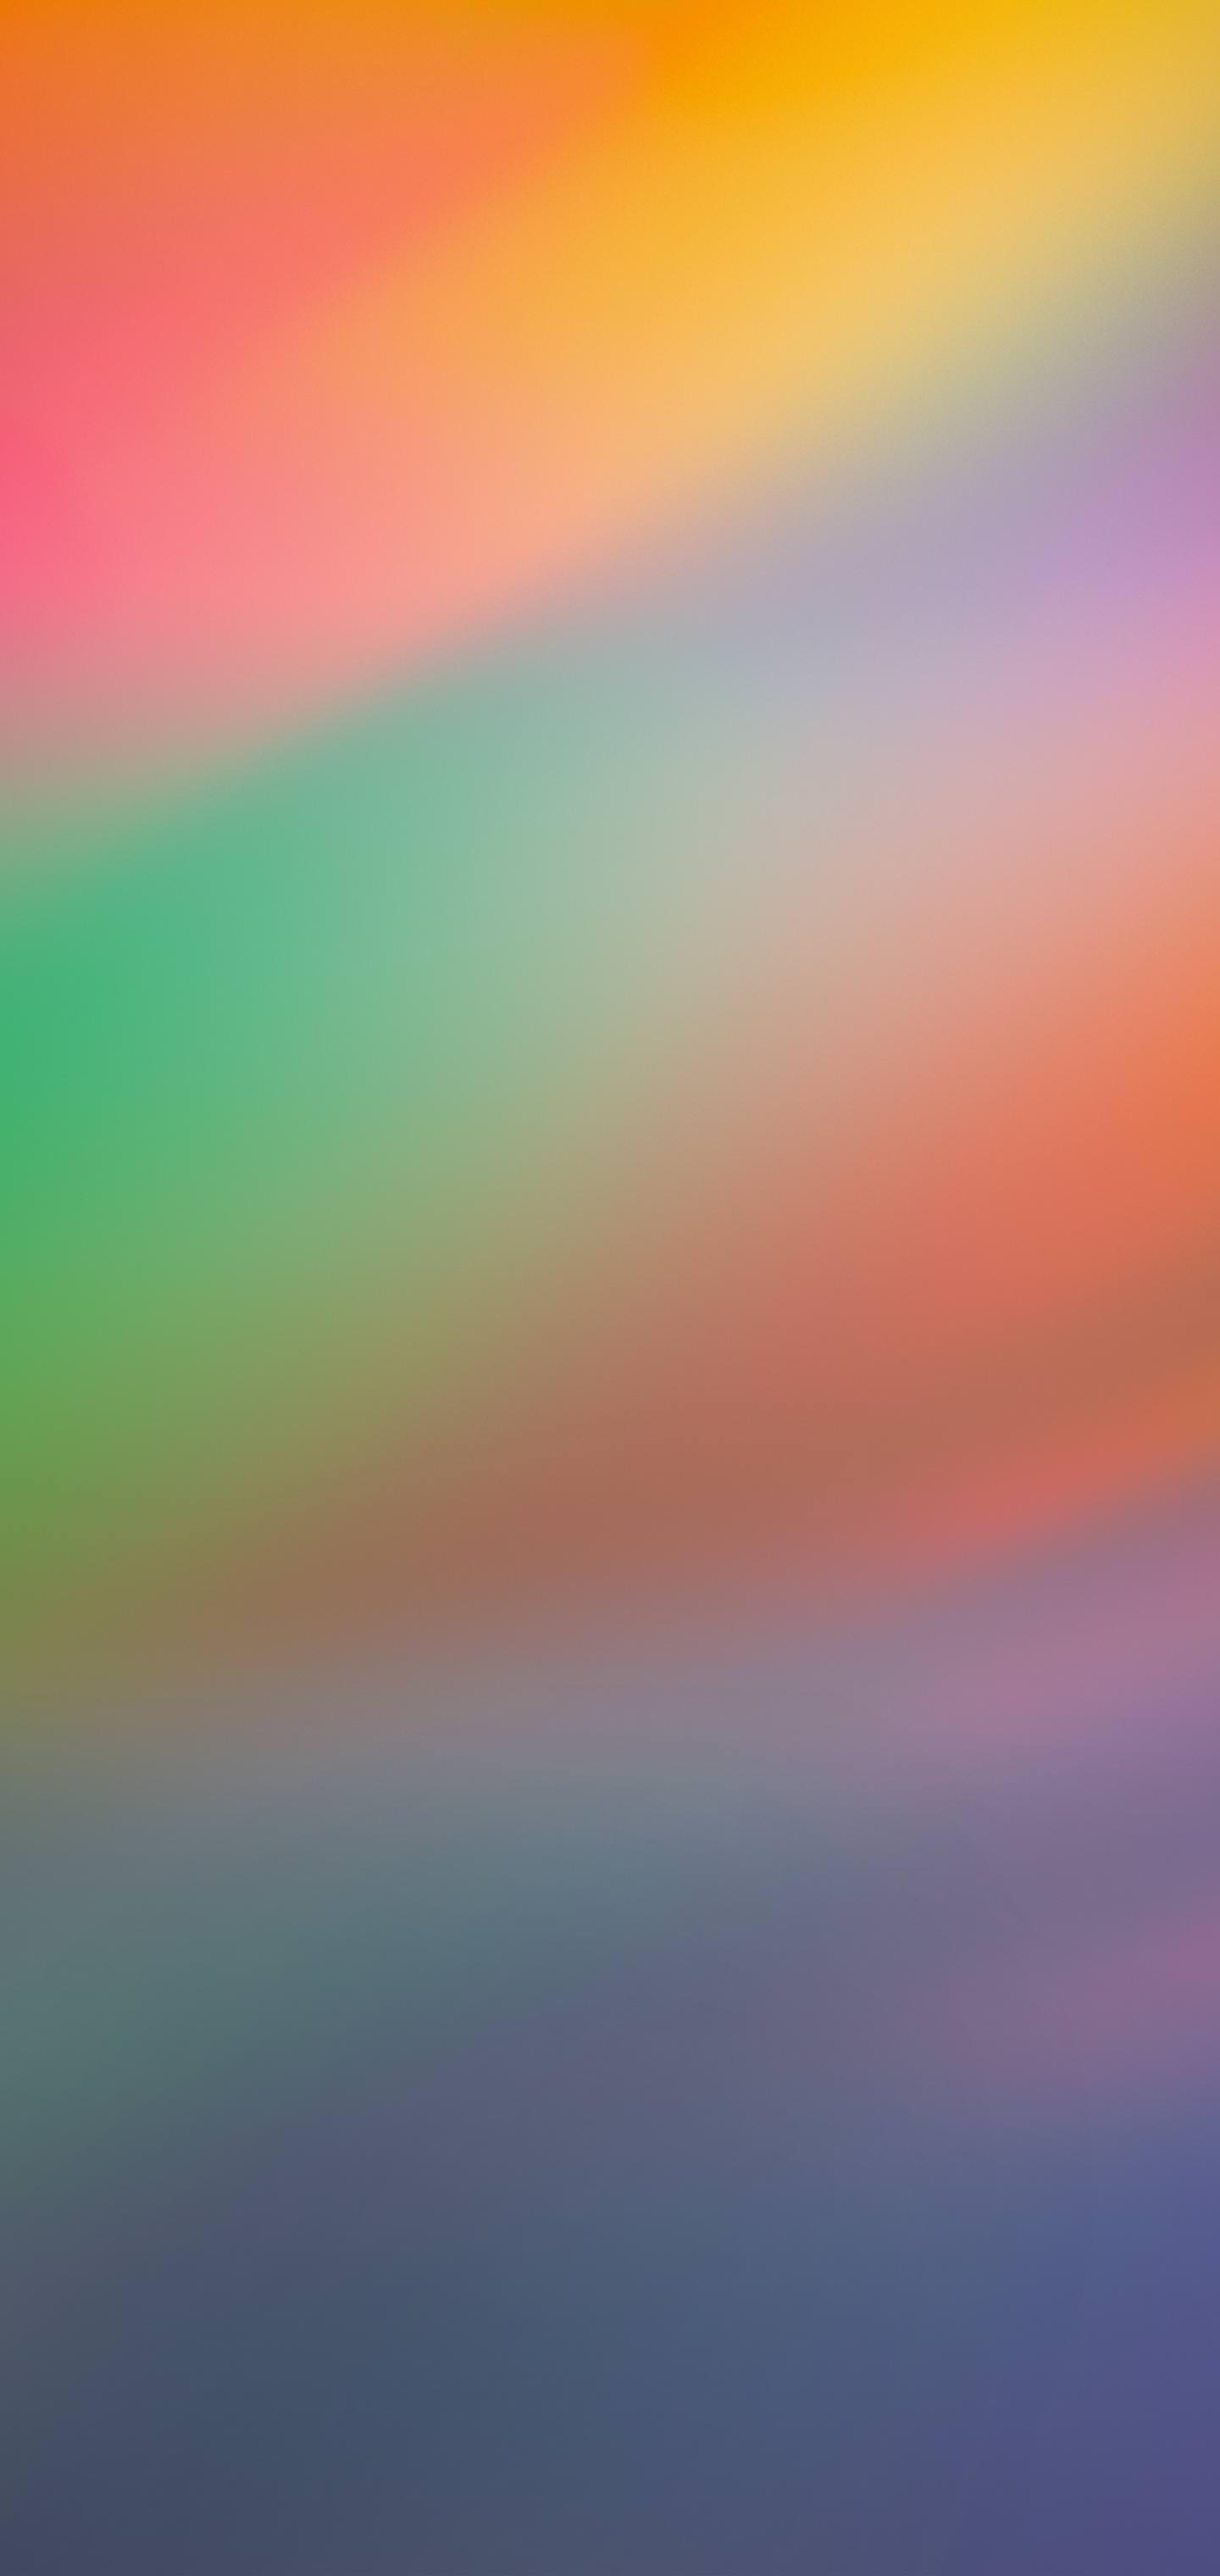 Download Samsung Wallpaper Hd Backgrounds Download Itlcat